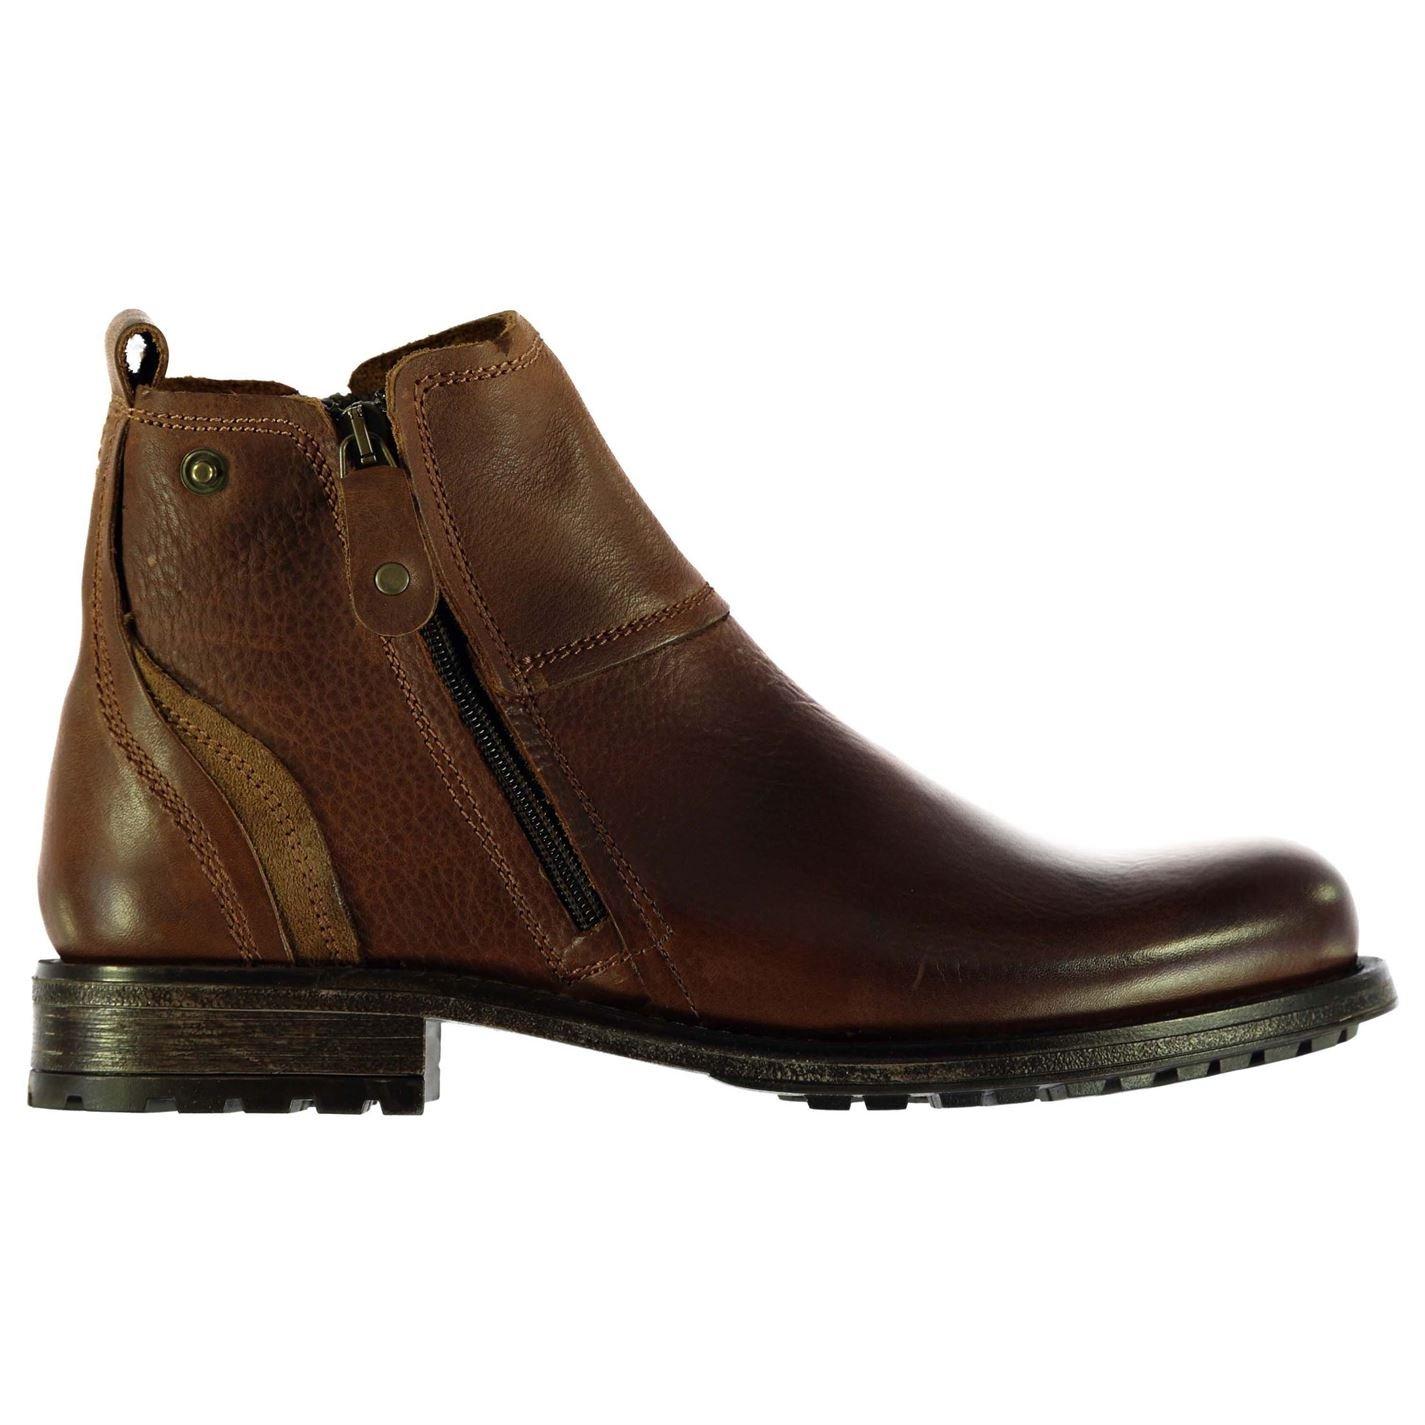 Firetrap Mens Jinx Smart Boots Double Side Zip Fastening Shoes Small Heel Tan UK 7 (41)